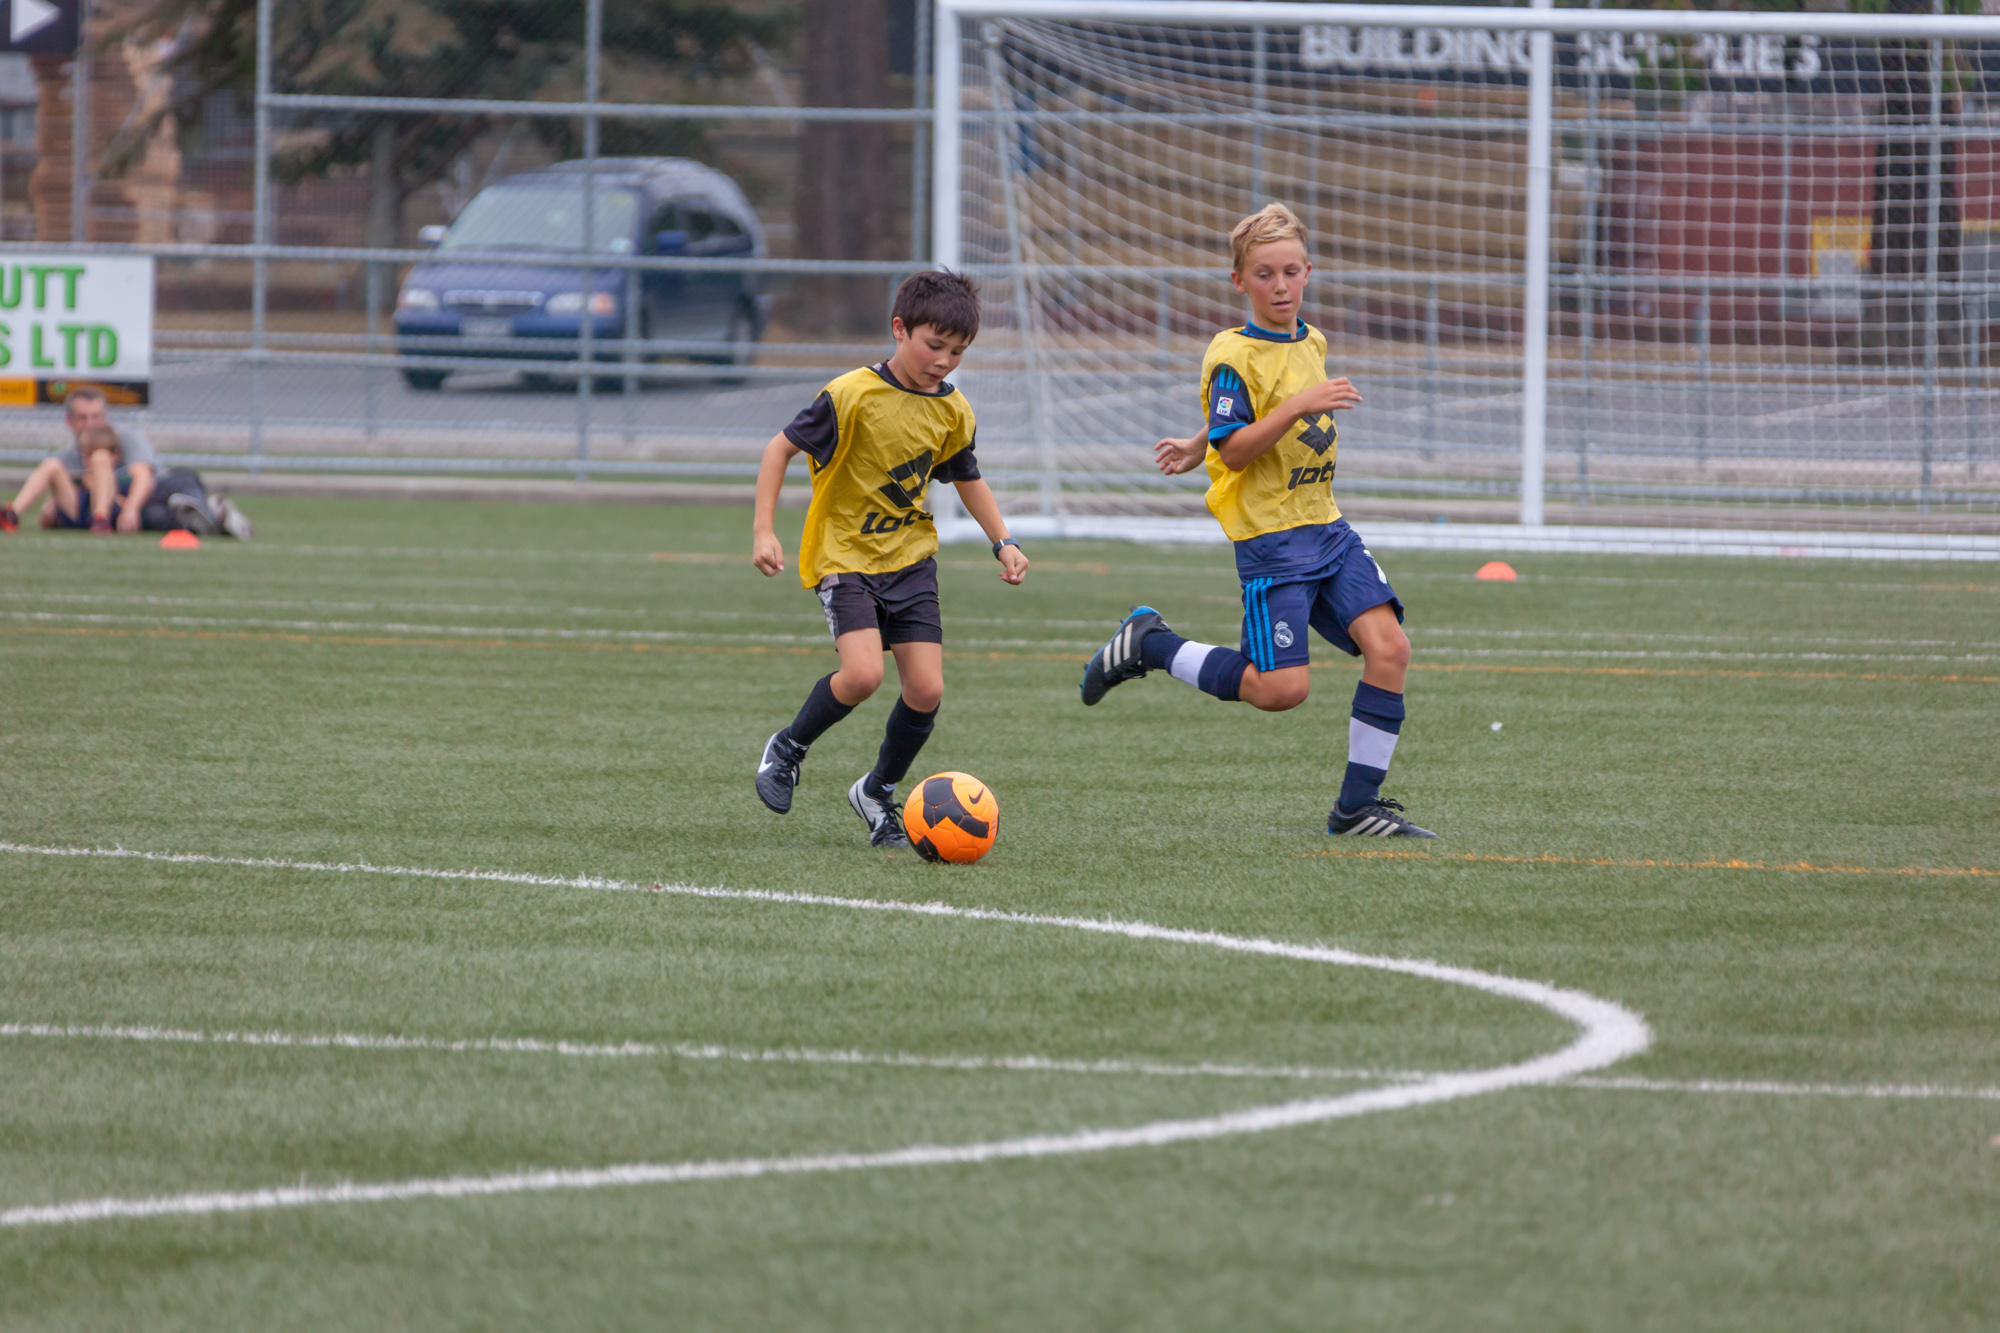 UHCC Soccer Coach 4479